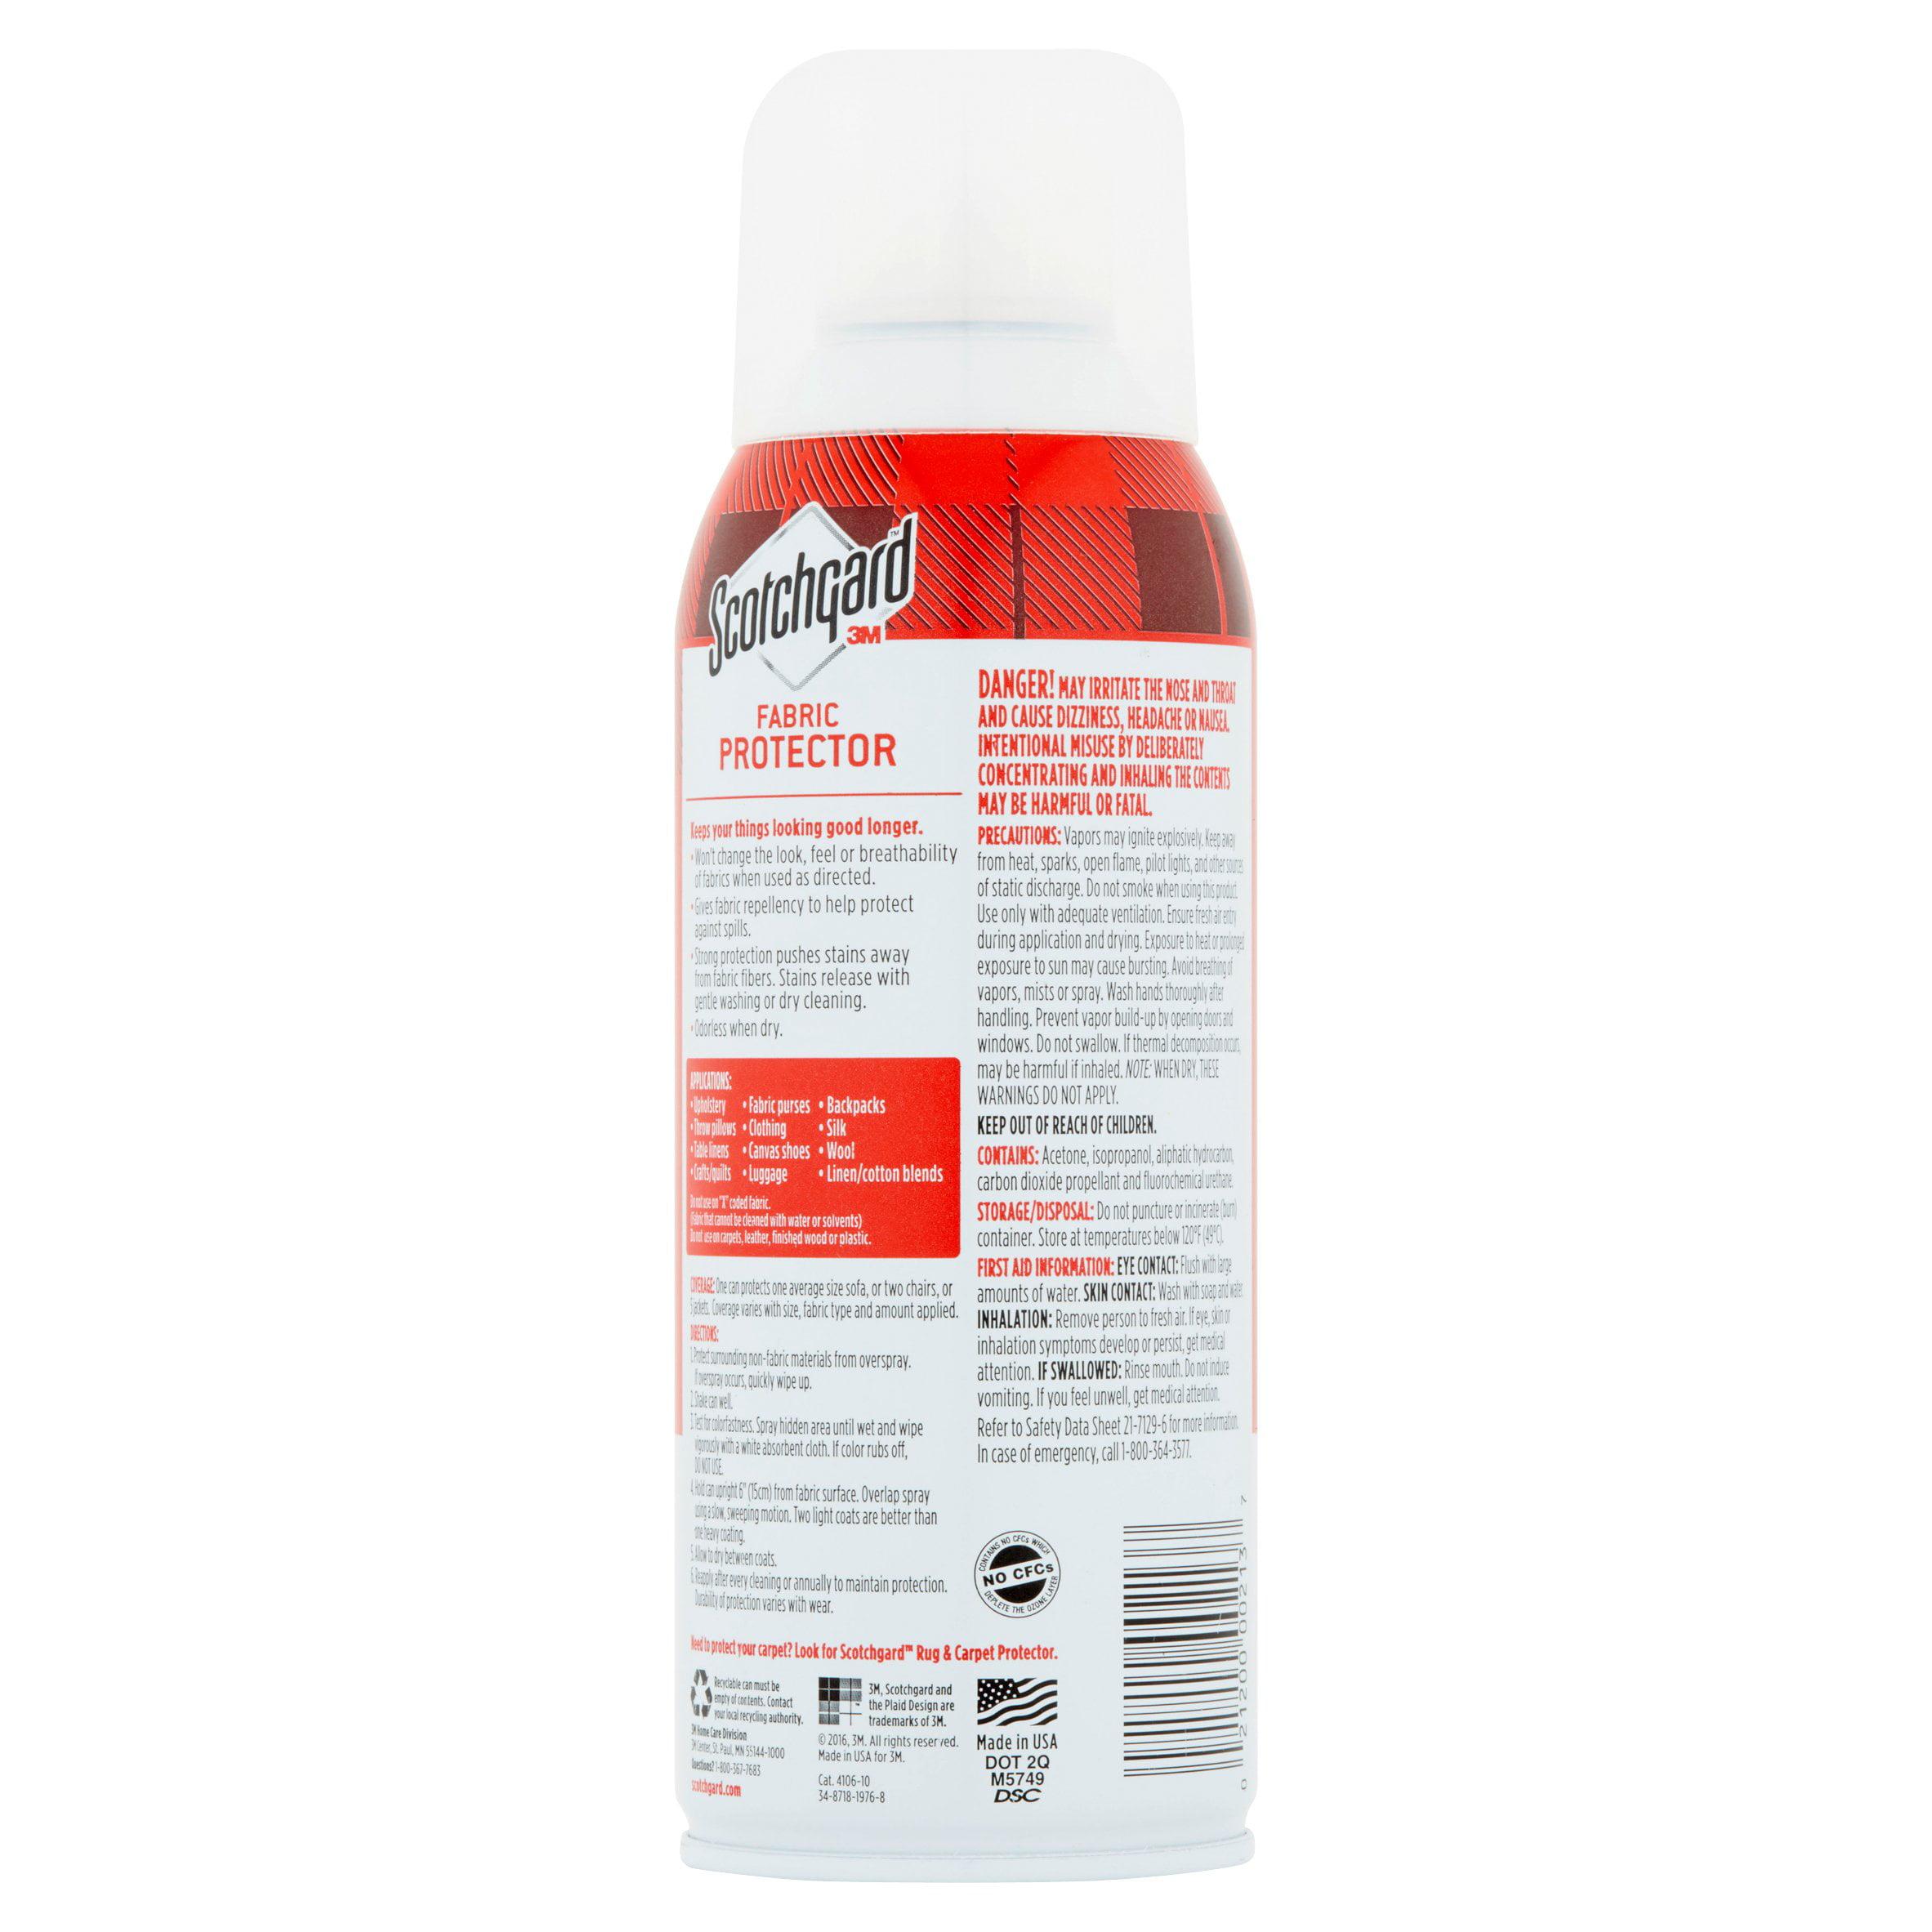 Car Carpet Cleaning Sunshine Coast: 3m 10 Oz Scotchgard Auto Fabric And Carpet Spray Protector